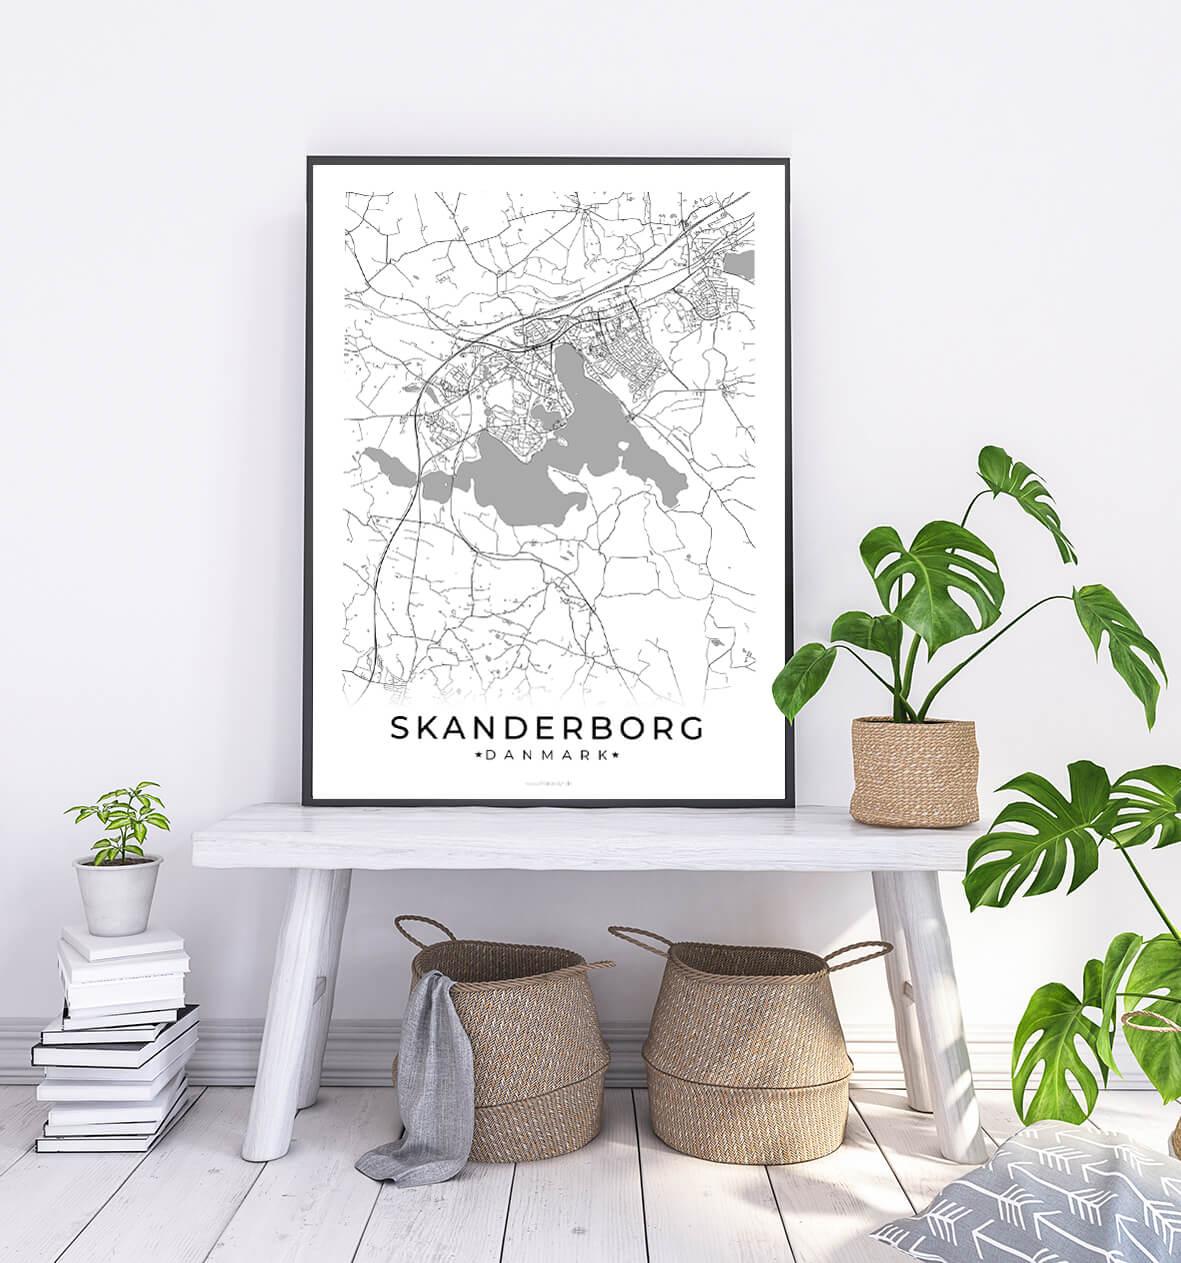 Skanderborg-hvid-byplakat-1